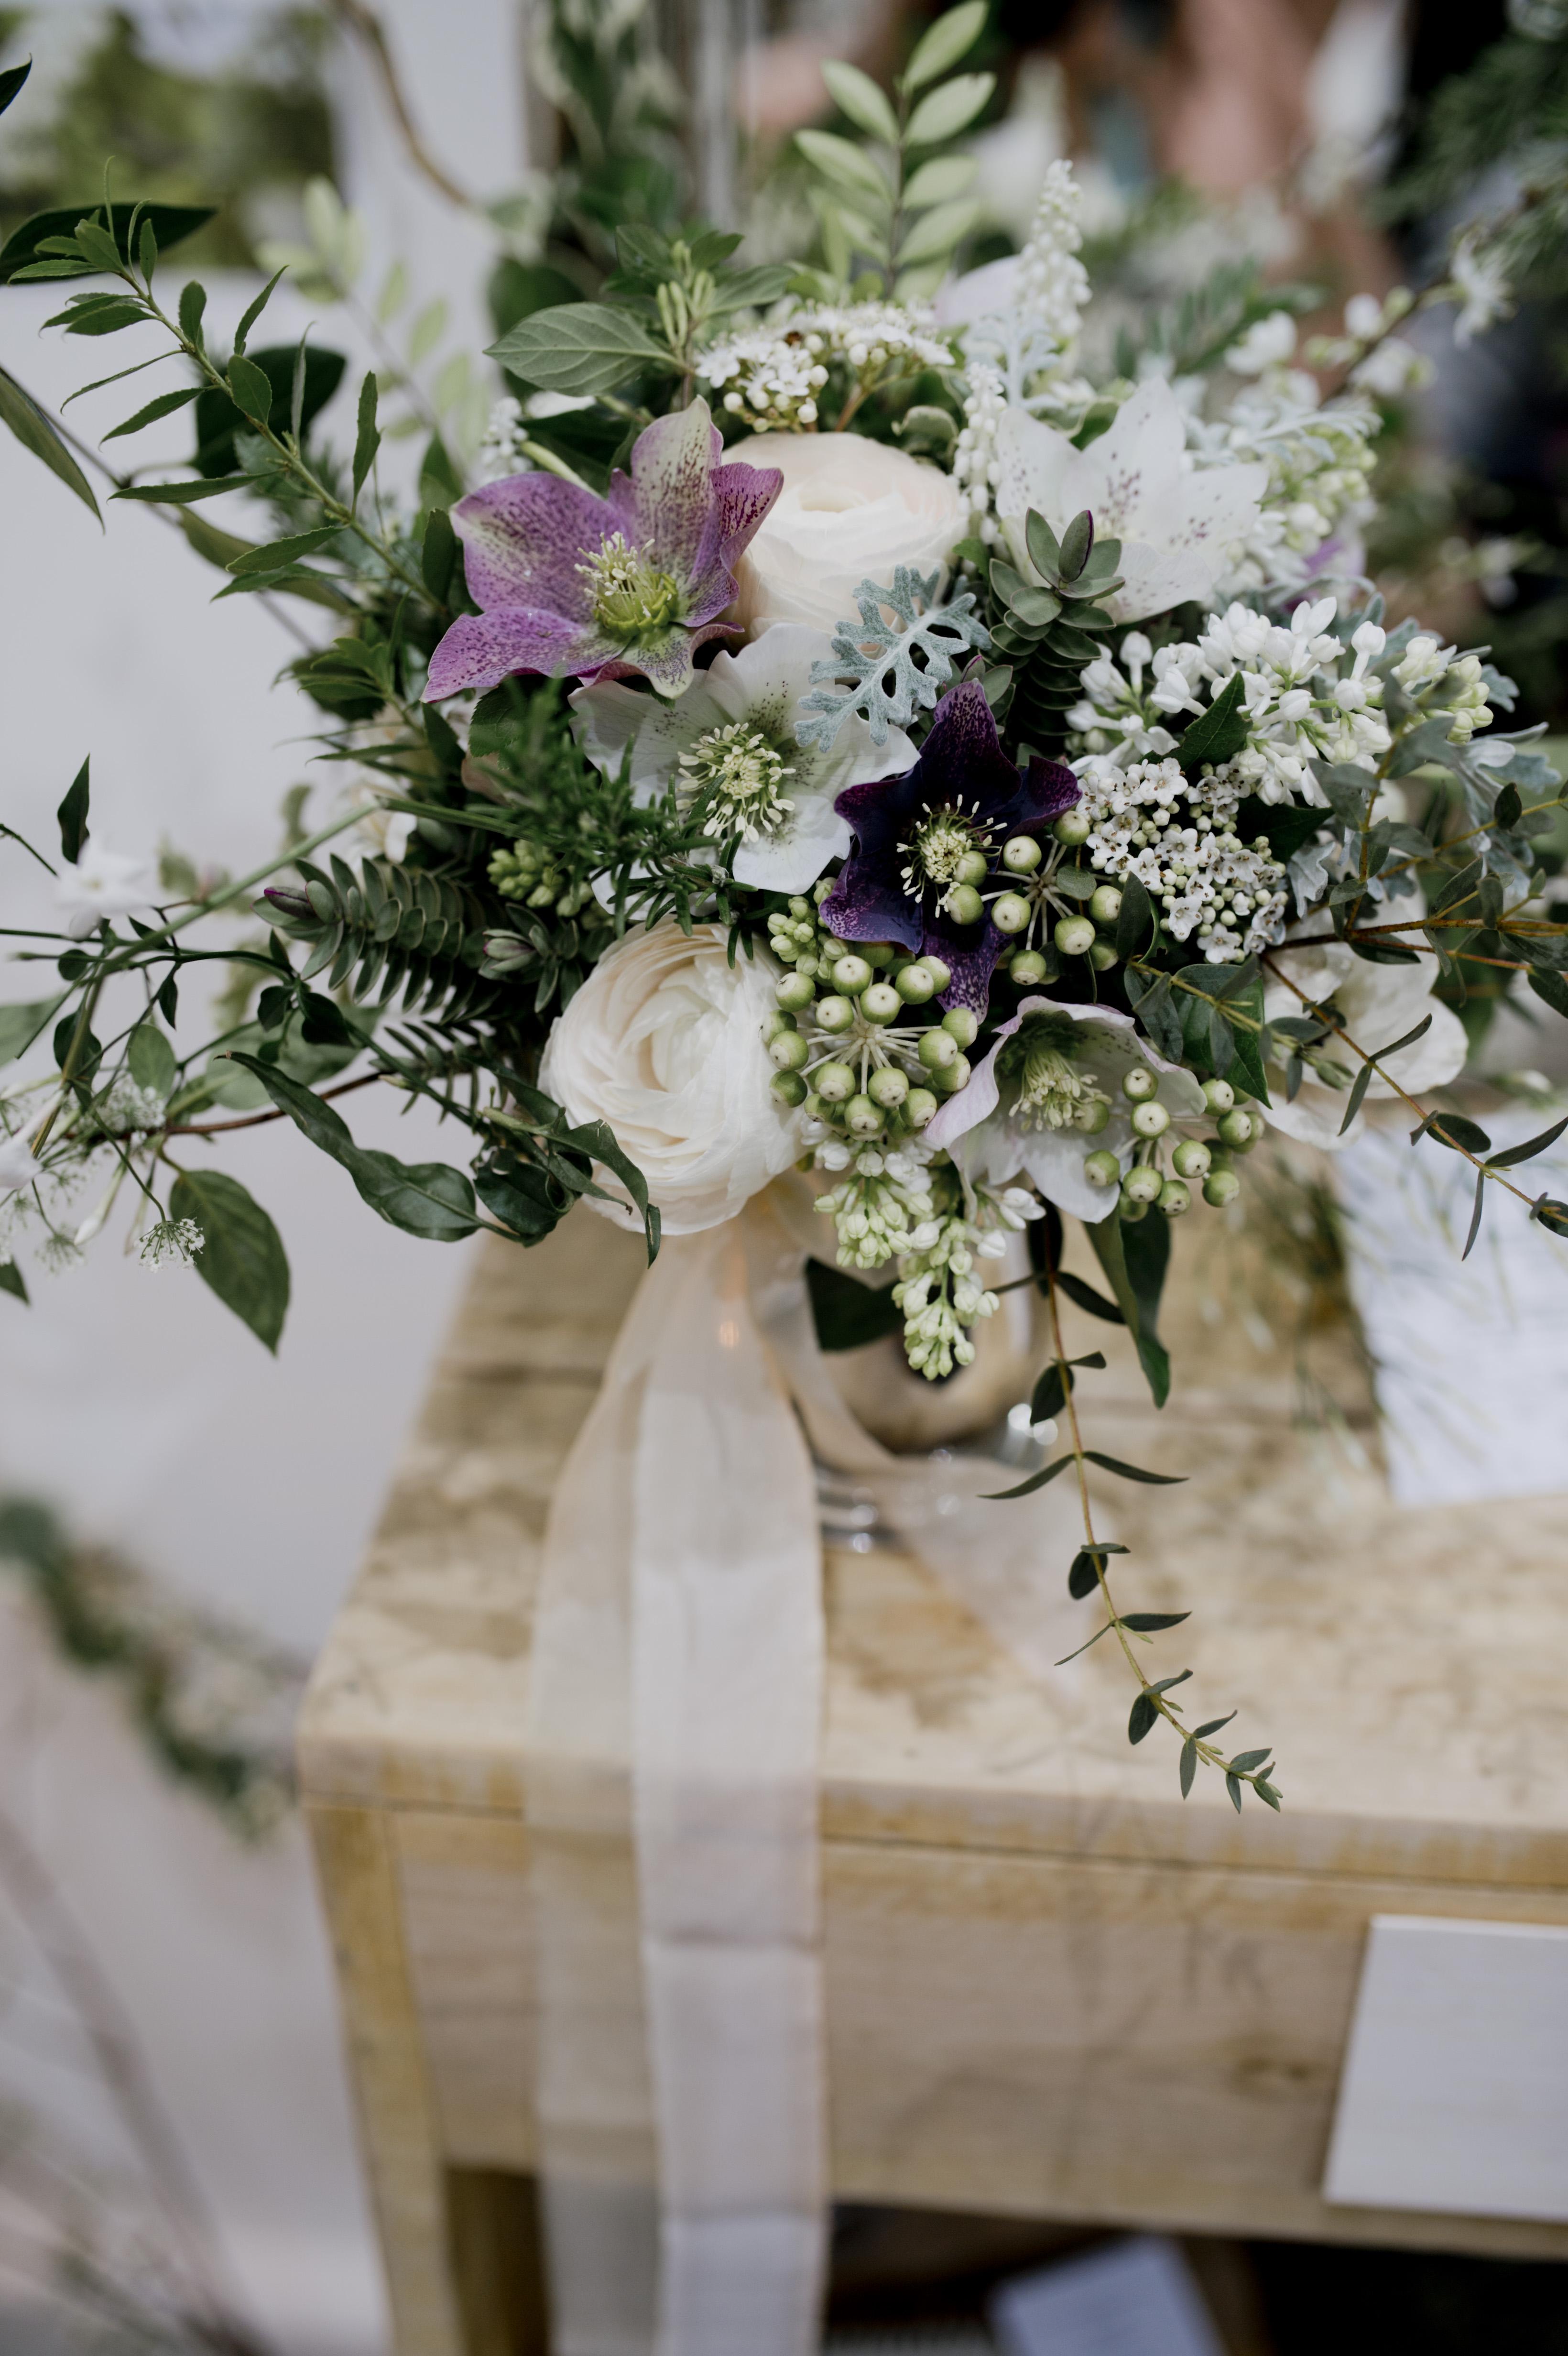 solveigetronanphotographesloveectteagardenflowers_11.JPG